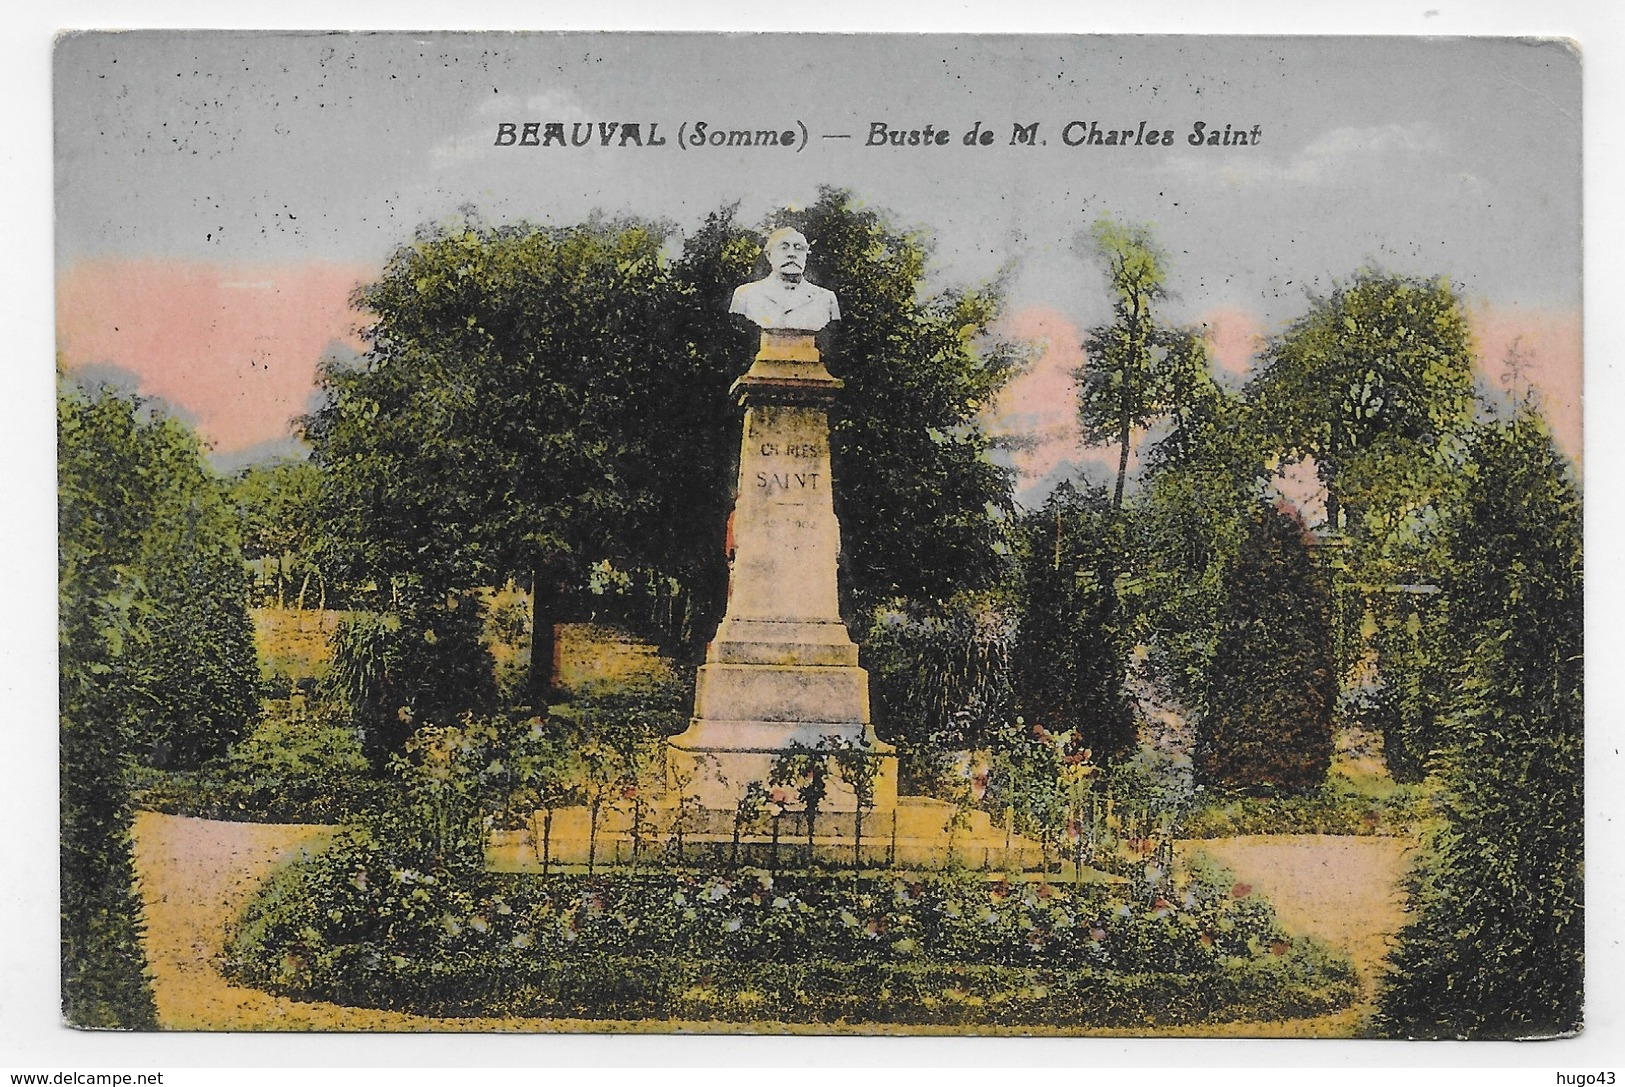 BEAUVAL - BUSTE DE M. CHARLES SAINT - CPA COULEUR NON VOYAGEE - Beauval